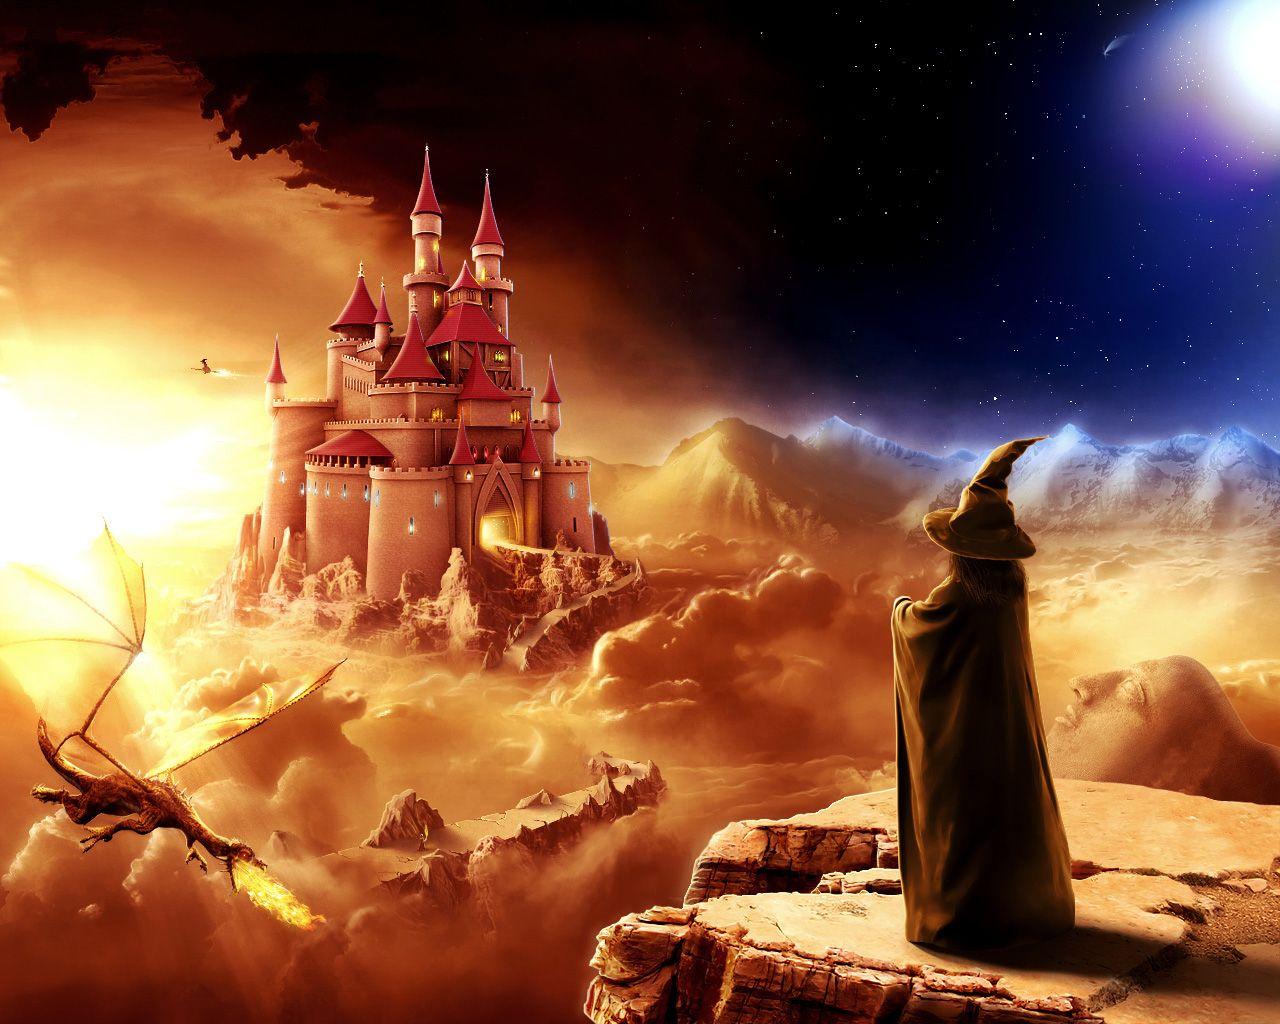 fanticy free online fantasy wallpapers full hd desktop